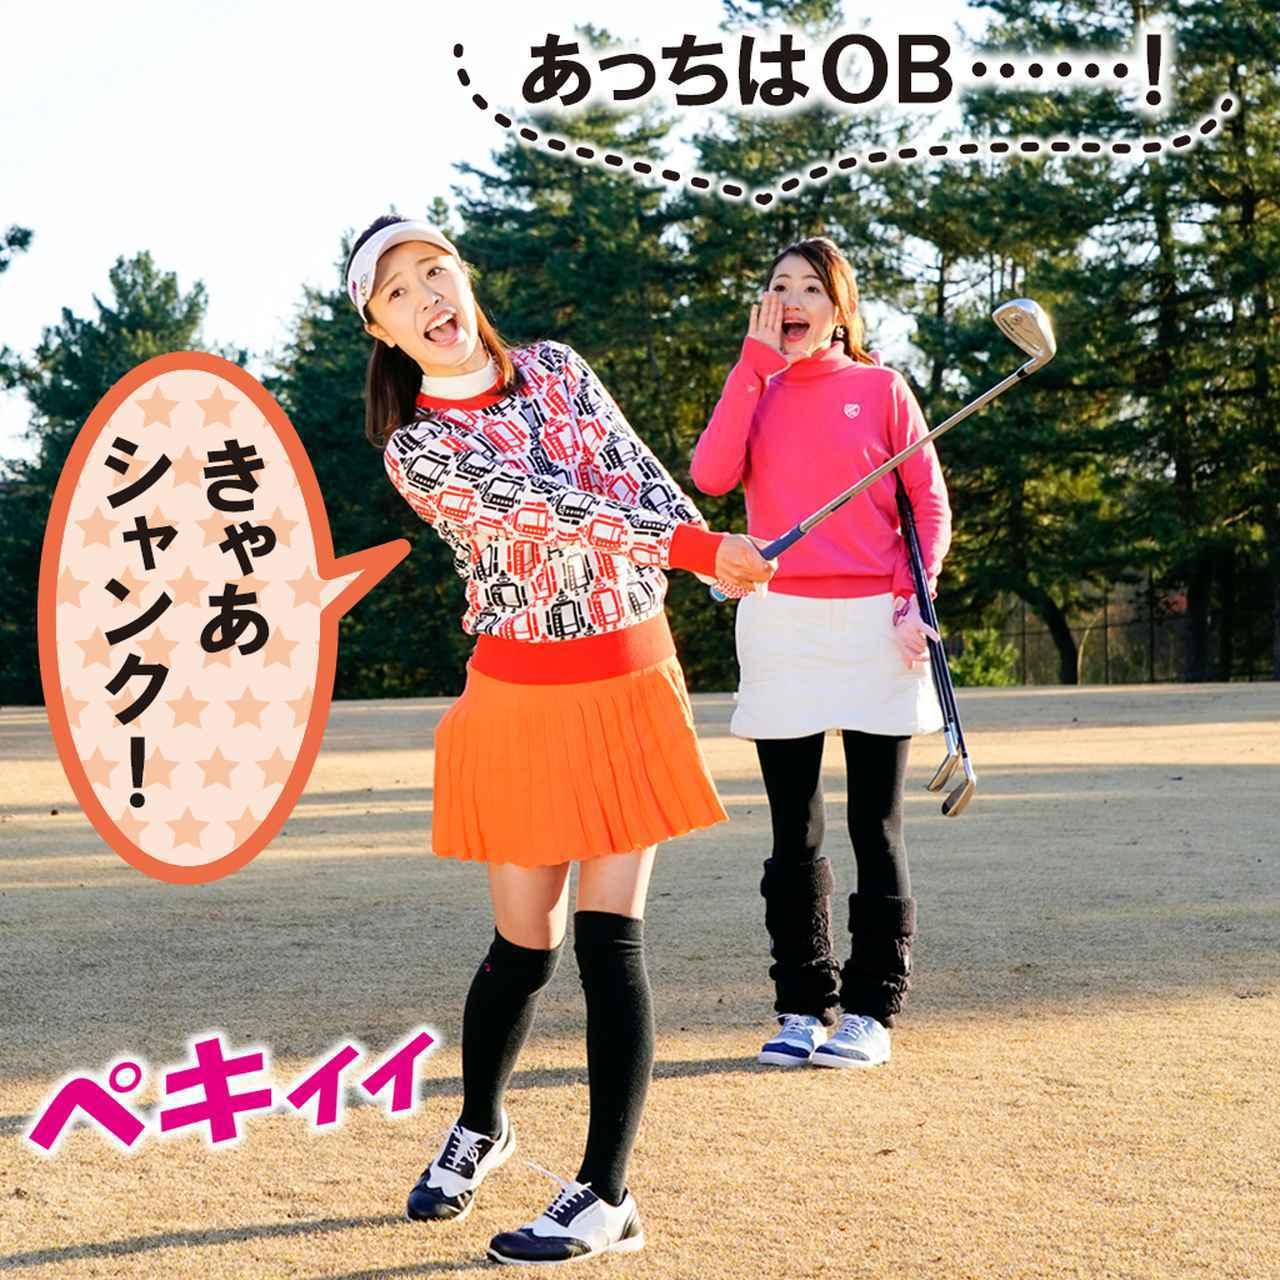 画像: (左)会員番号40 萩原菜乃花、(右)会員番号21 中里さや香